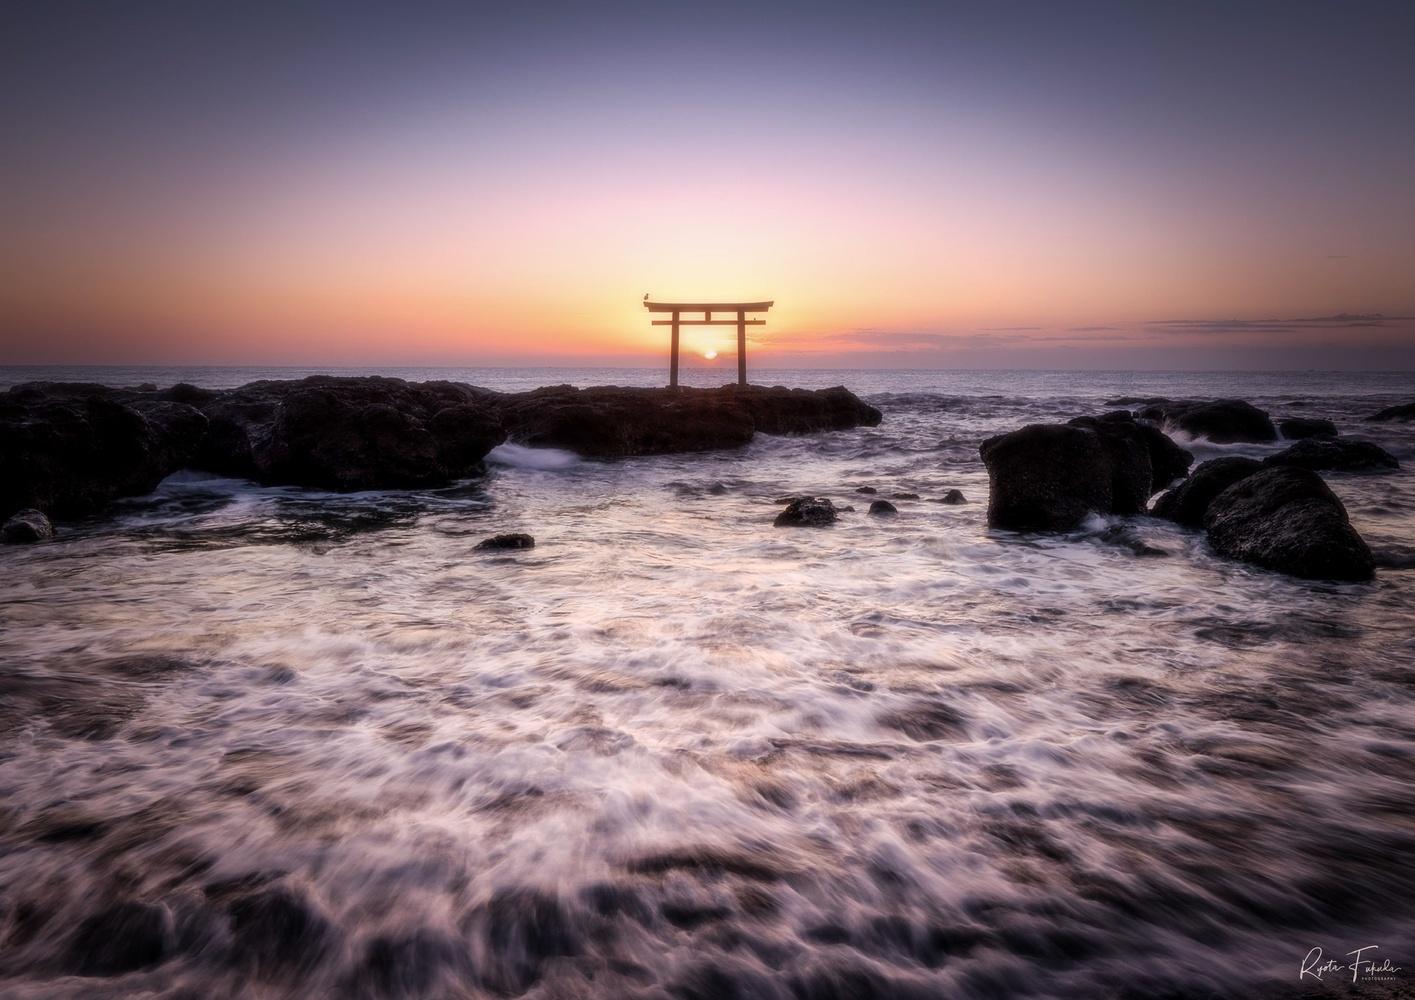 First sunrise by Ryota Fukuda